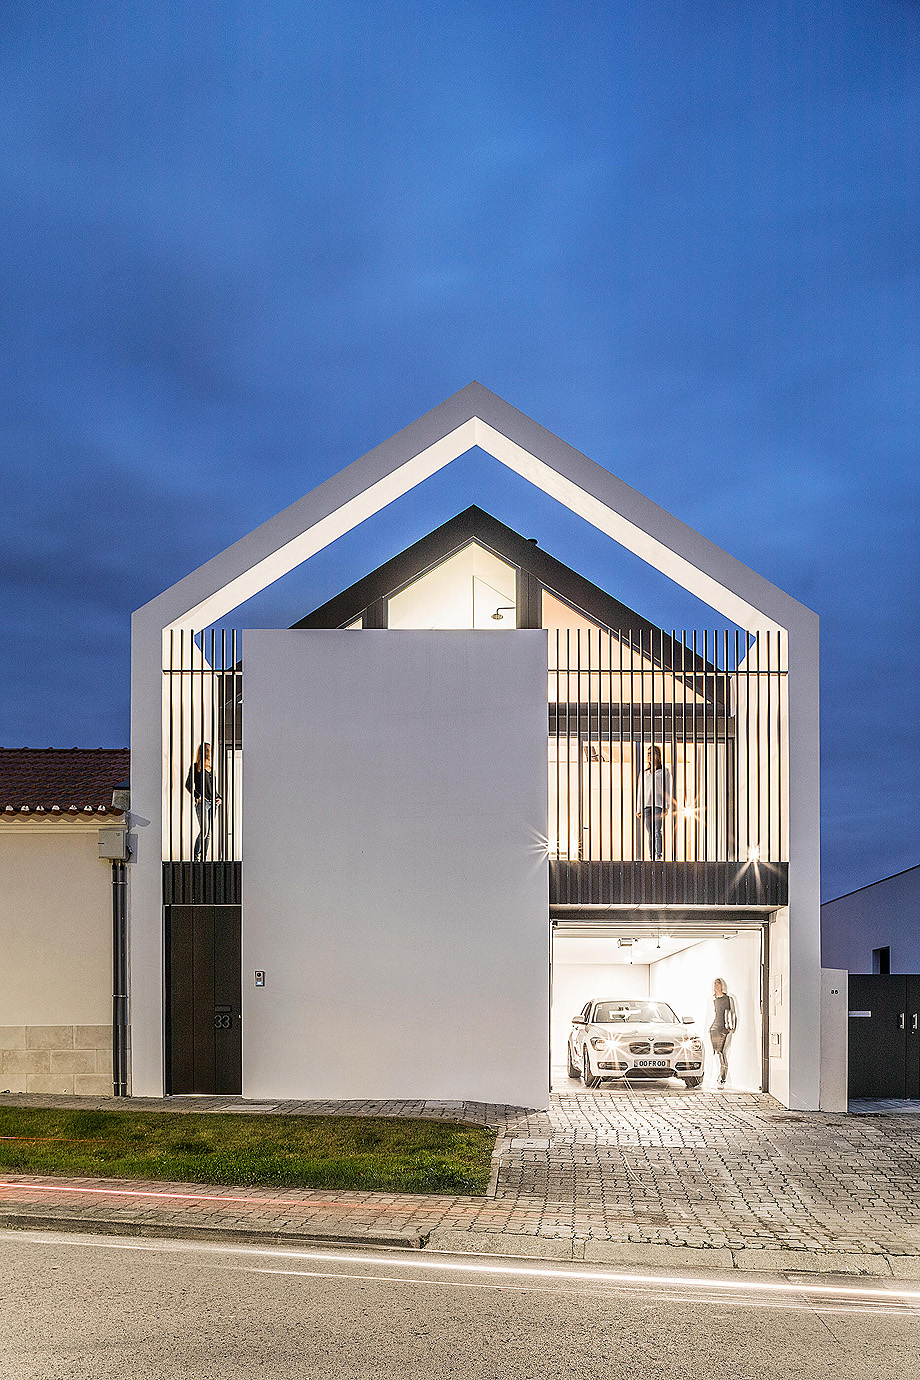 casa do arco de frari architecture network - foto ivo tavares (41)